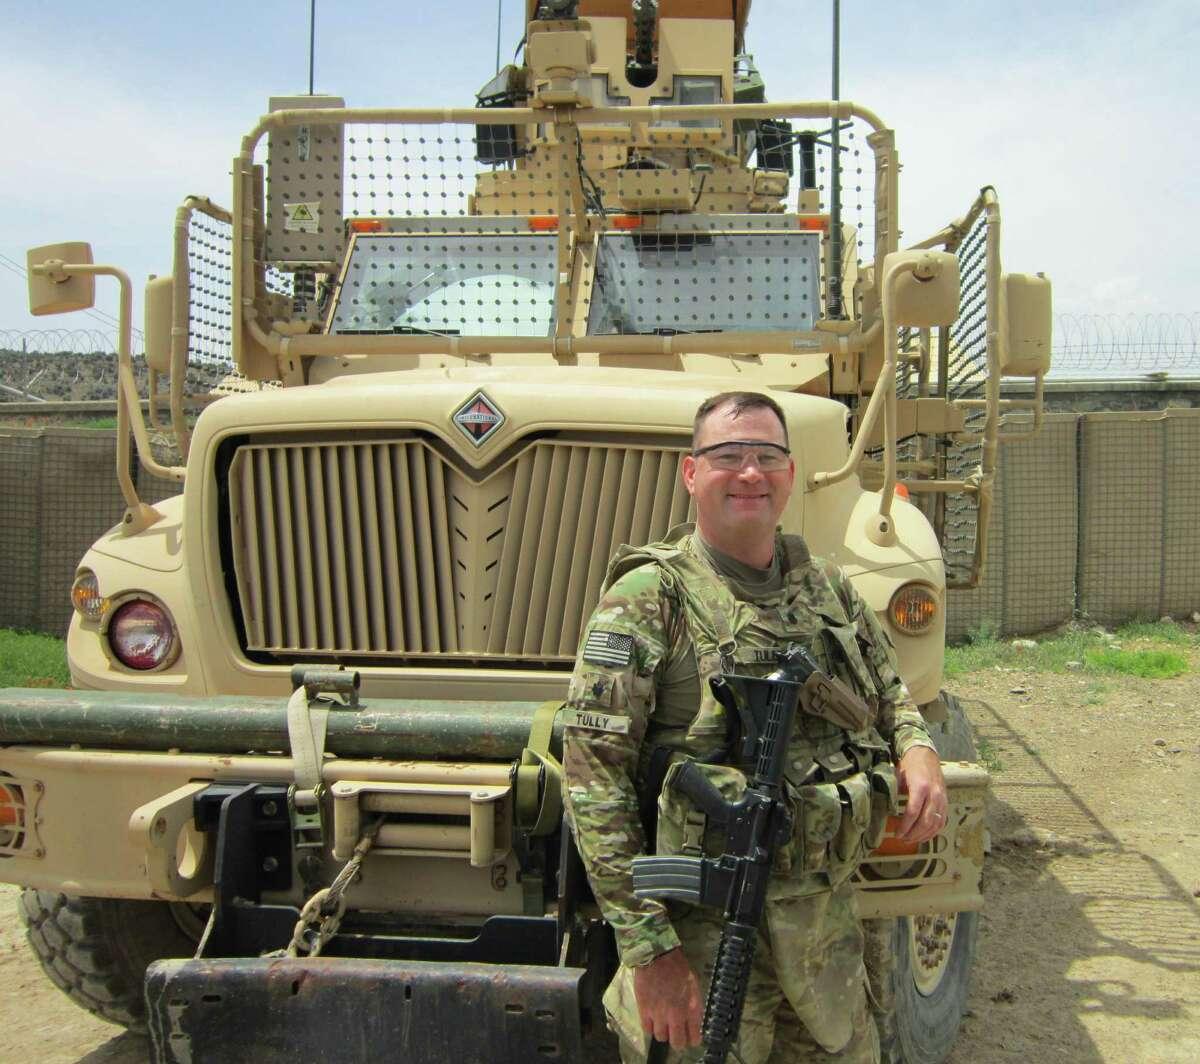 Lt. Col. Mathew Tully